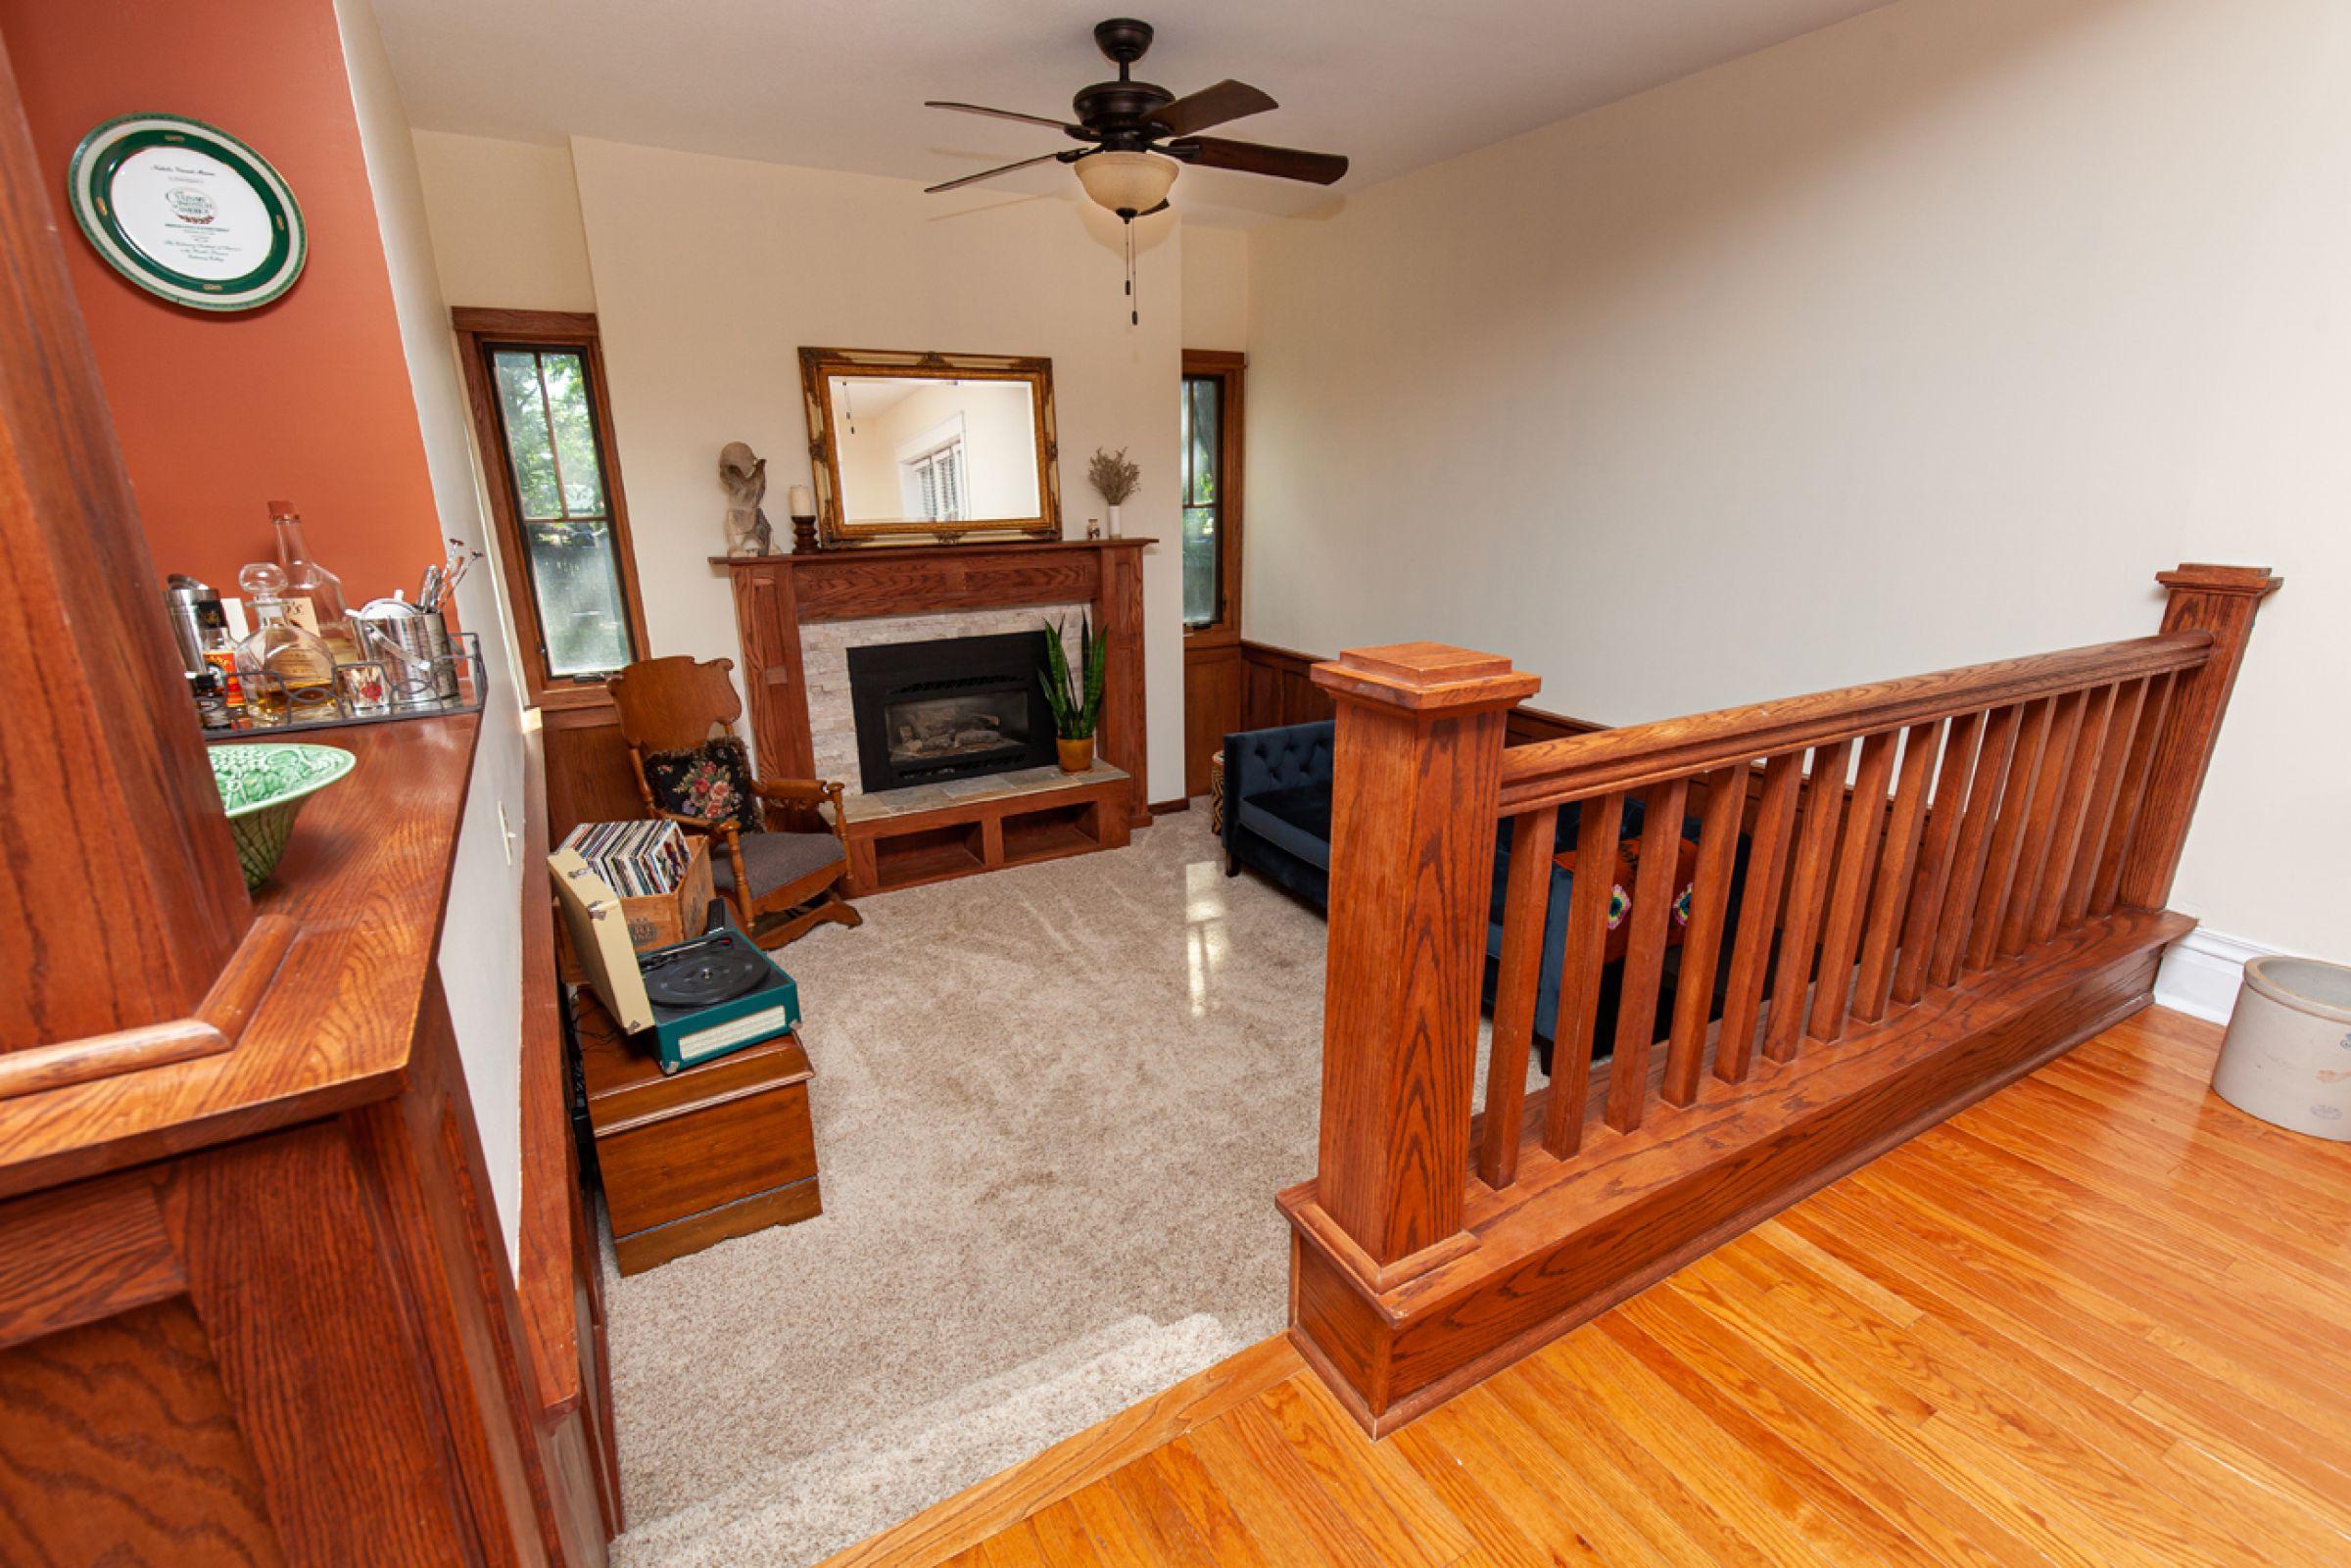 residential-polk-county-iowa-0-acres-listing-number-15153-1-2020-09-02-233543.jpg